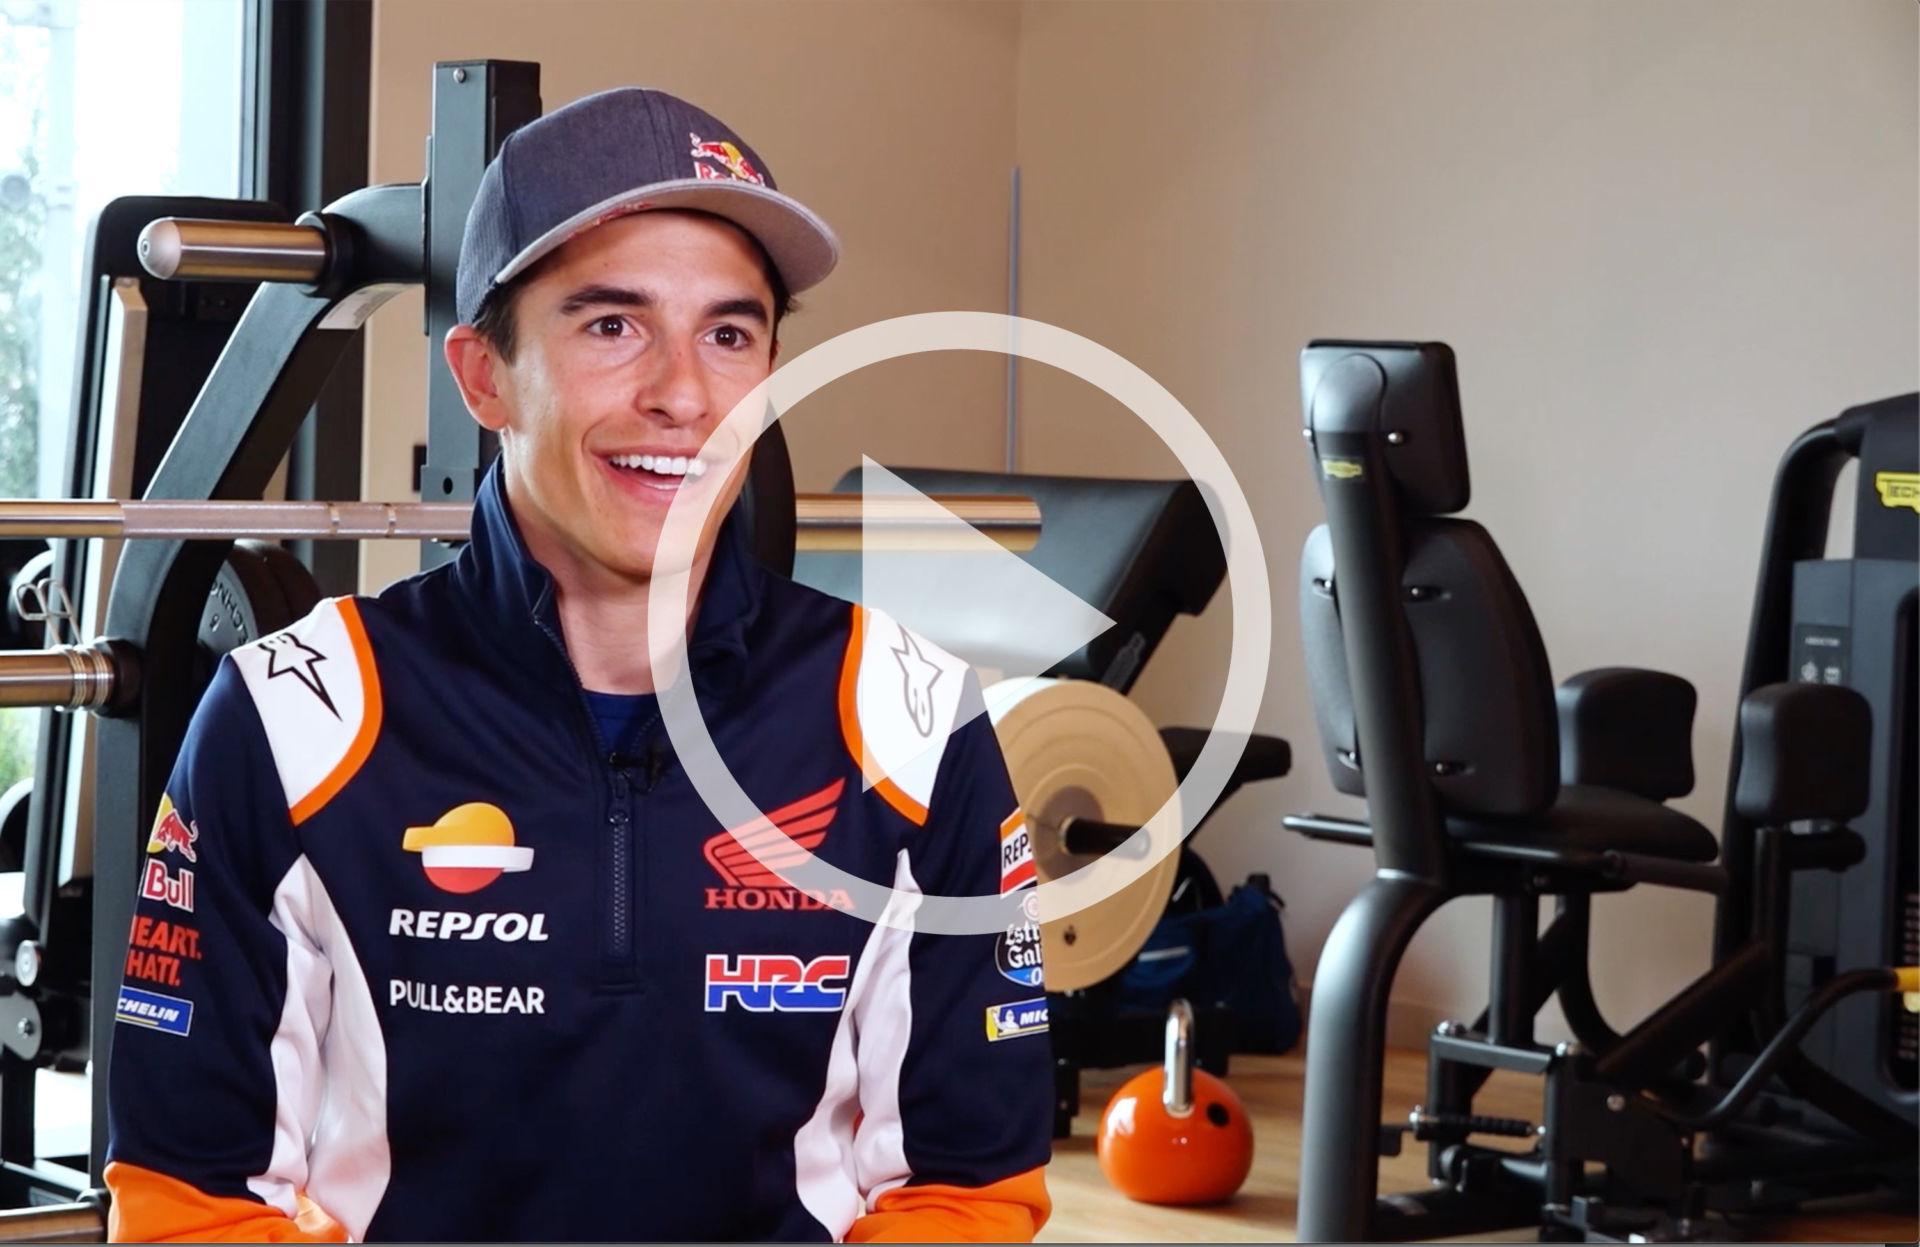 Eight-time World Champion Marc Marquez. Photo courtesy Repsol Honda.